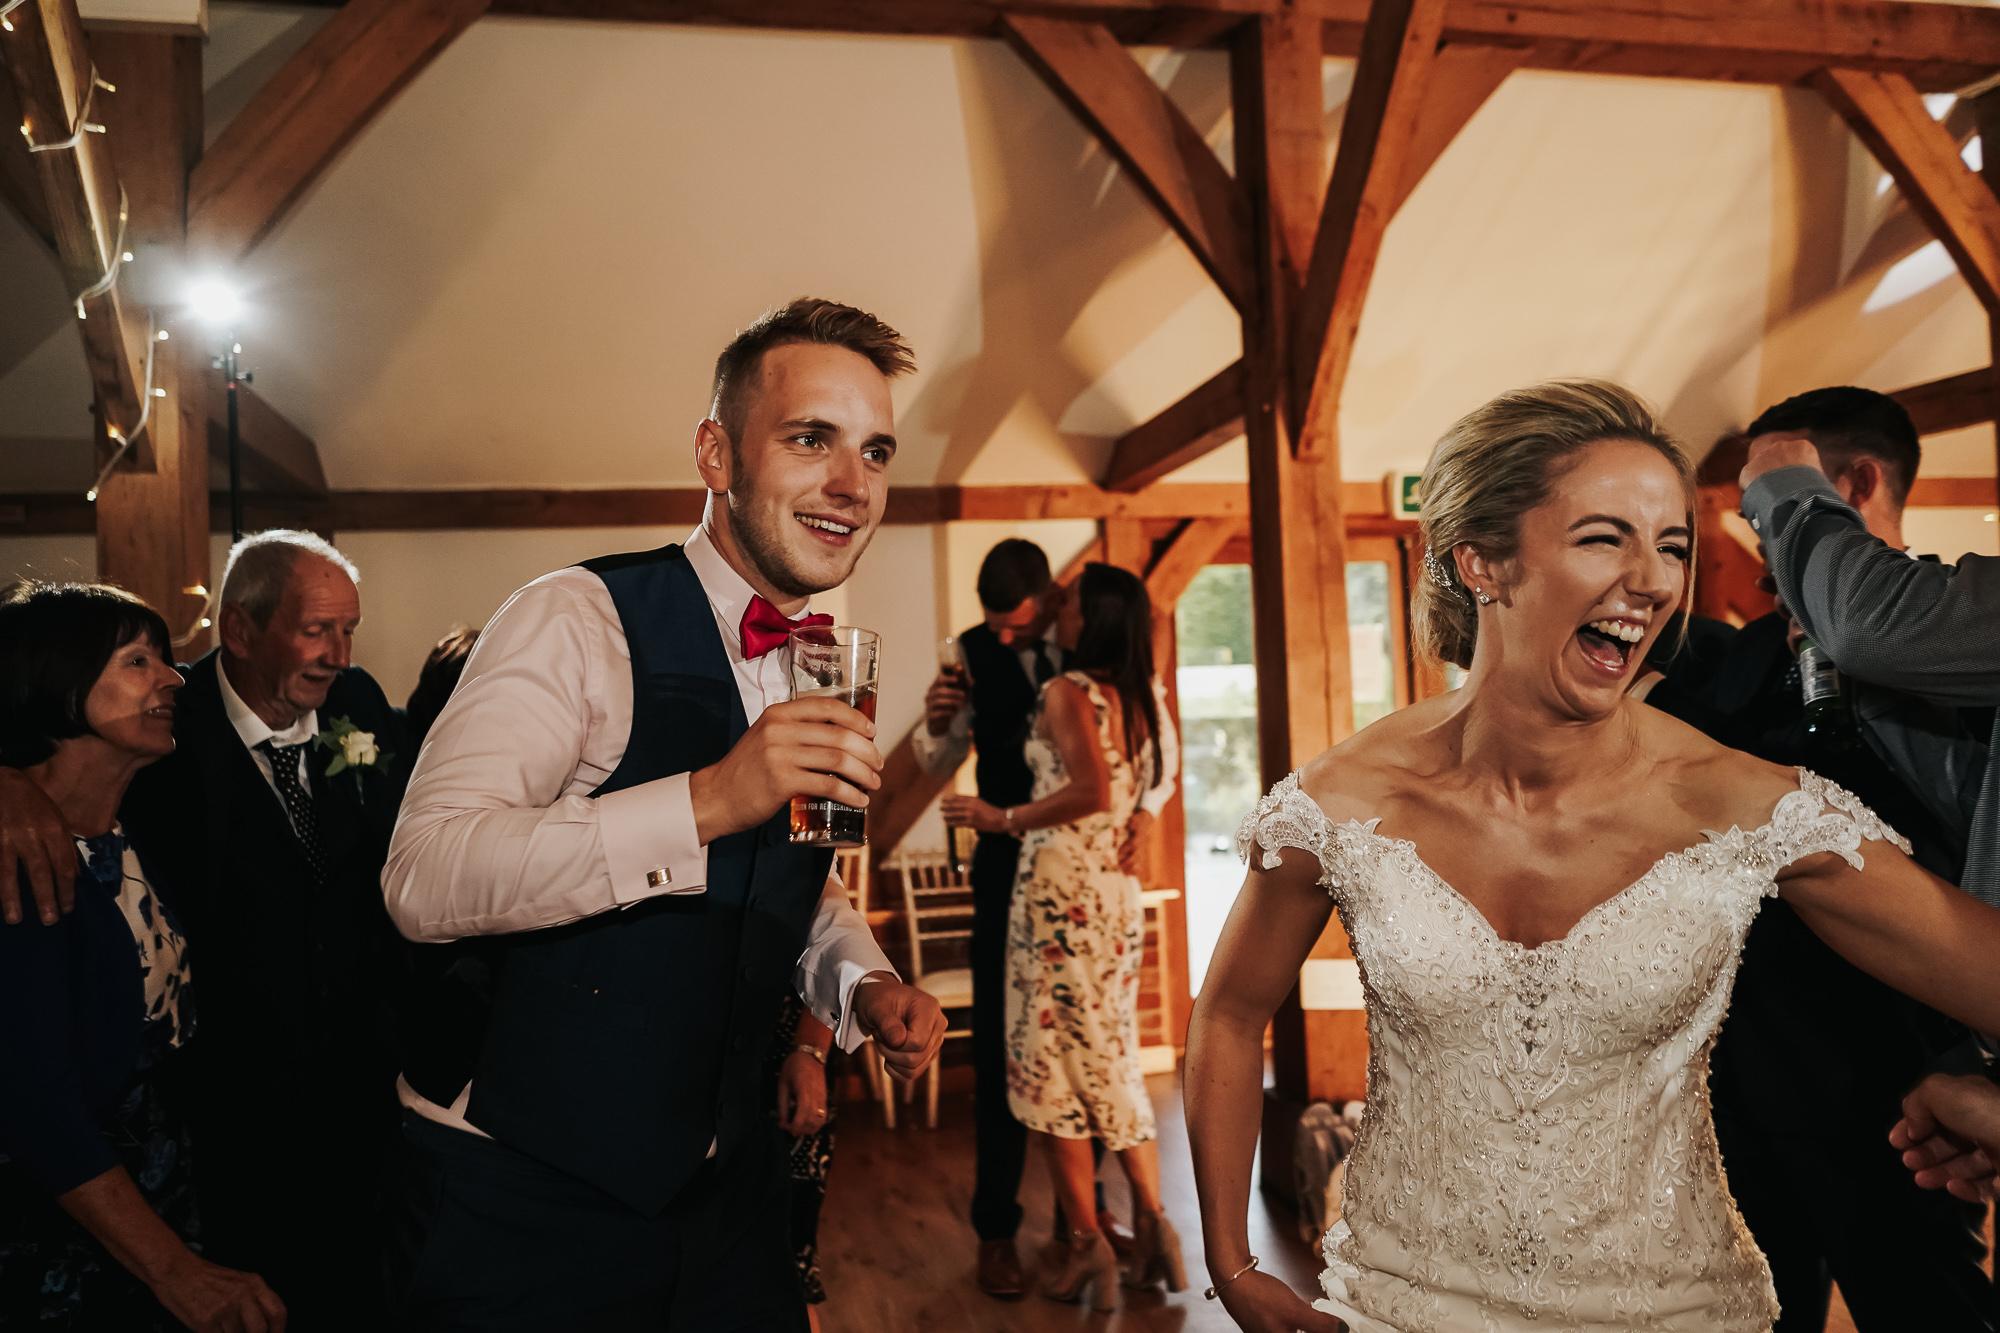 Sandhole Oak Barn Wedding Photography cheshire wedding photographer (55 of 56).jpg